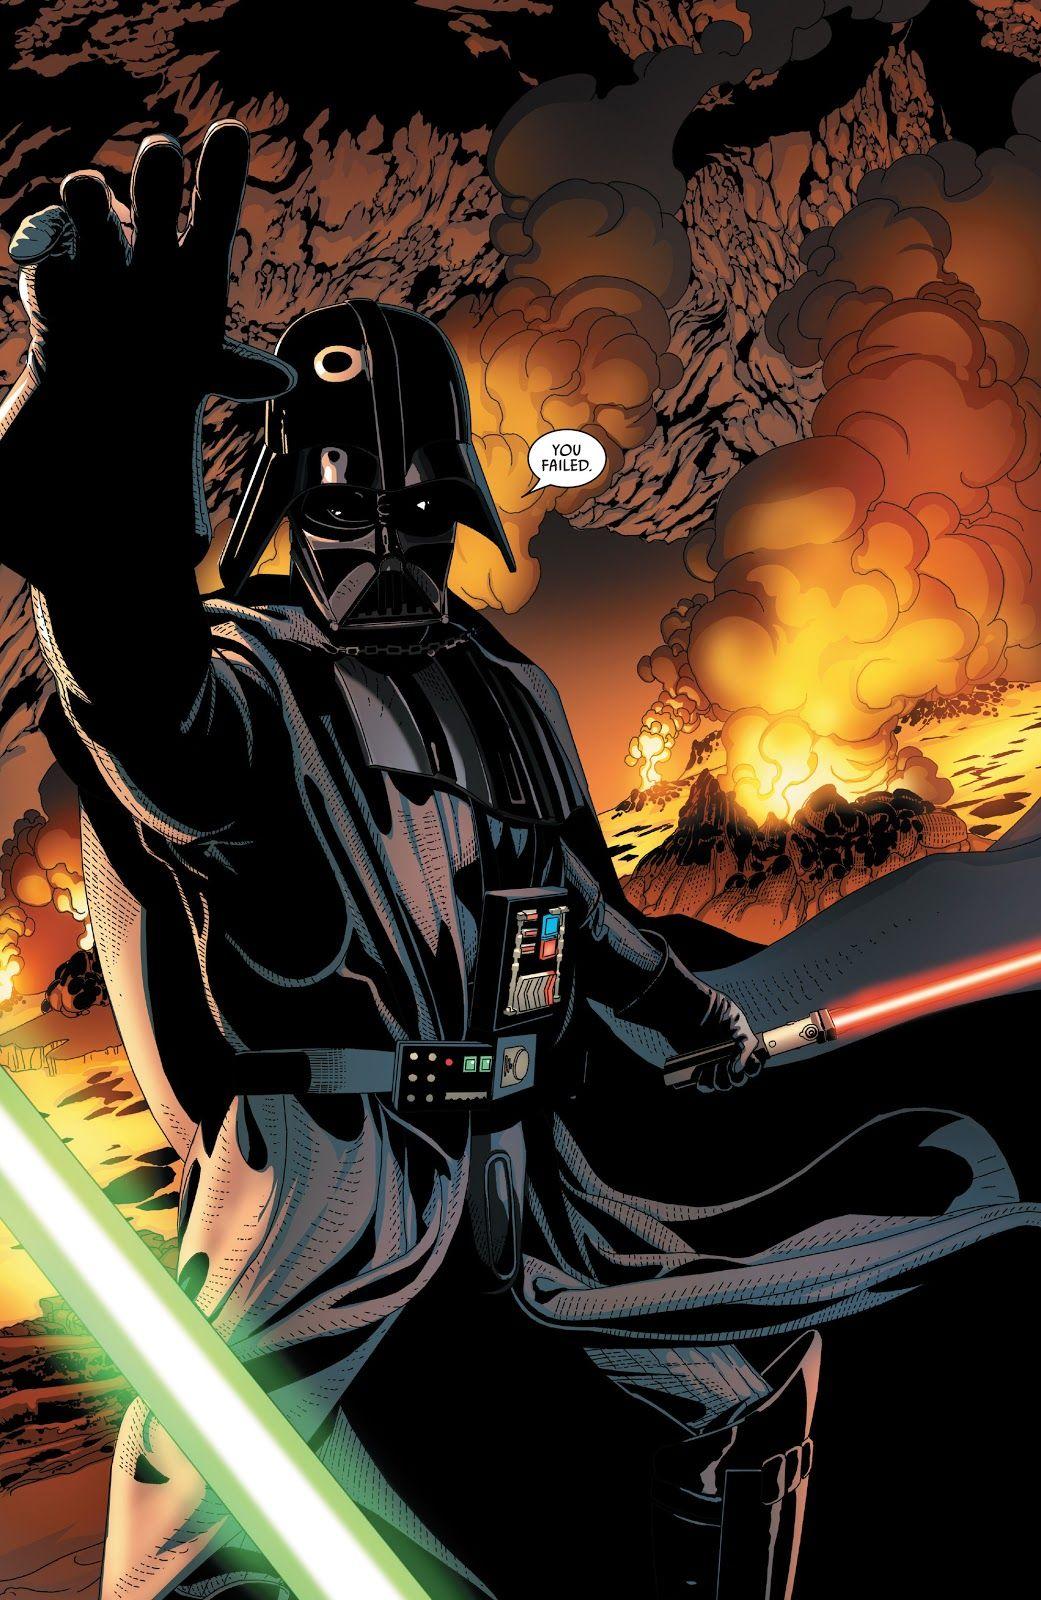 Darth Vader 2015 Issue 18 Read Darth Vader 2015 Issue 18 Comic Online In High Quality Darth Vader Star Wars Art Star Wars